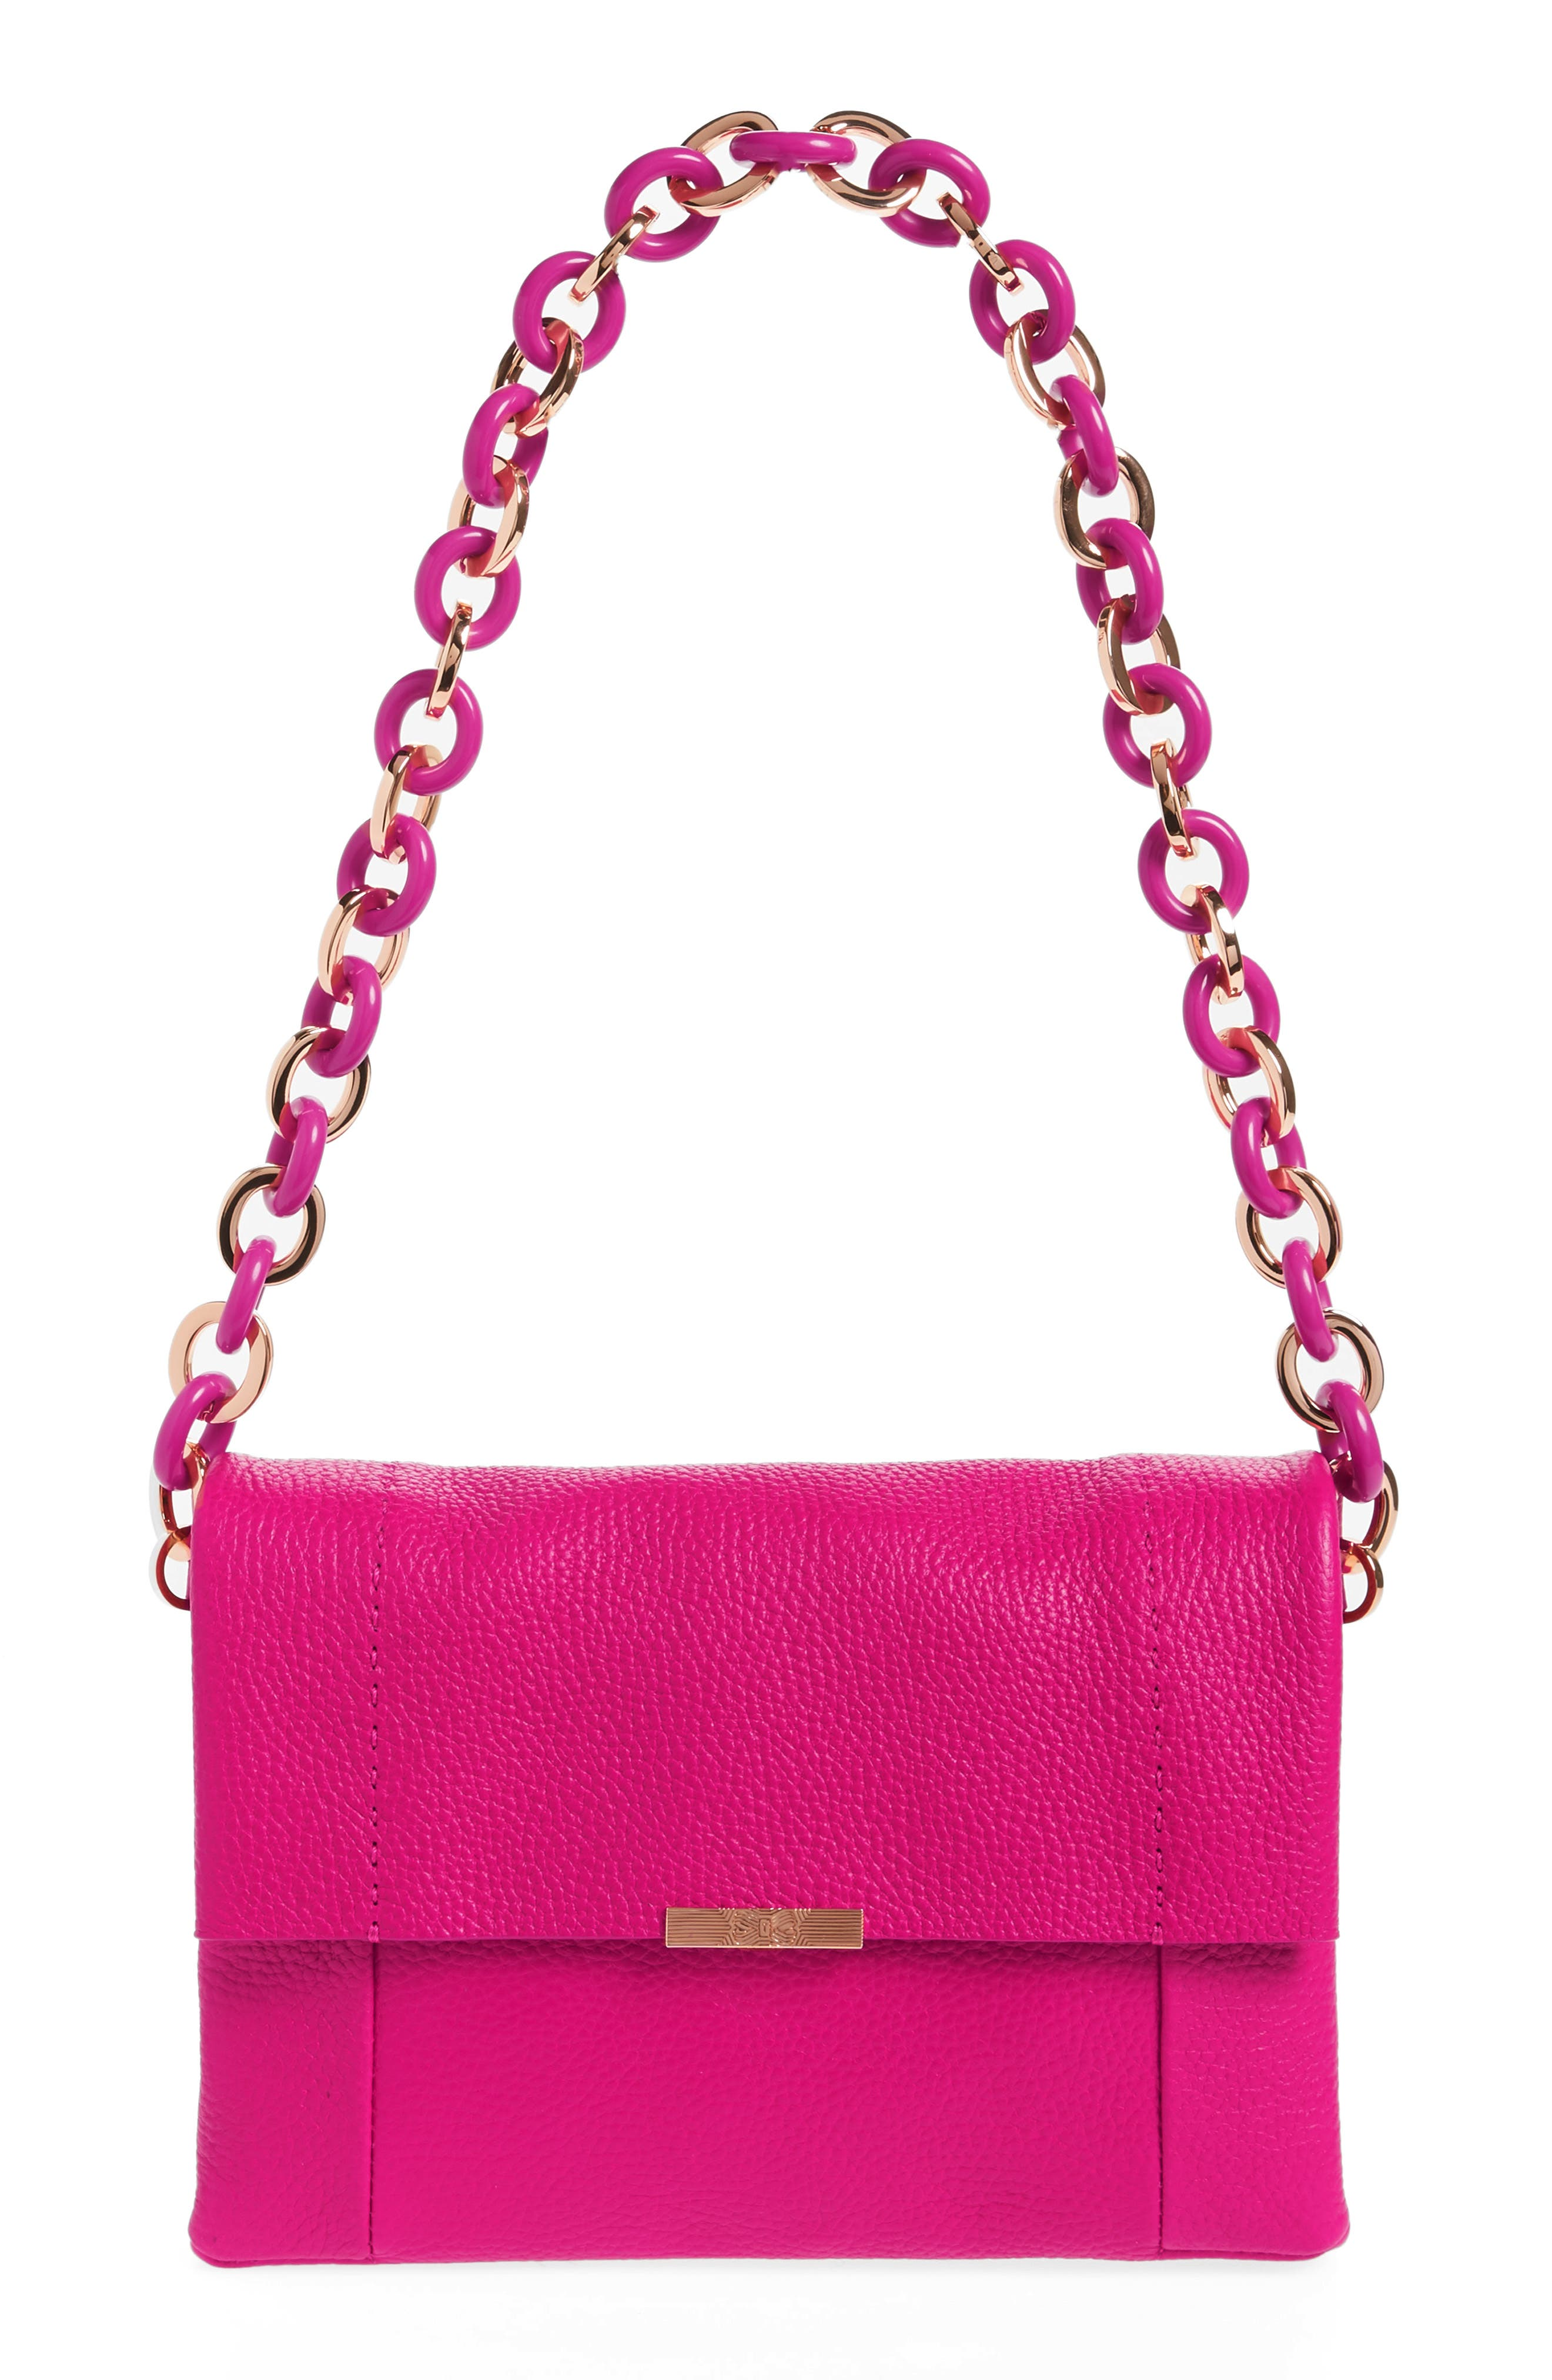 Ipomoea Leather Shoulder Bag,                             Main thumbnail 1, color,                             Fuchsia